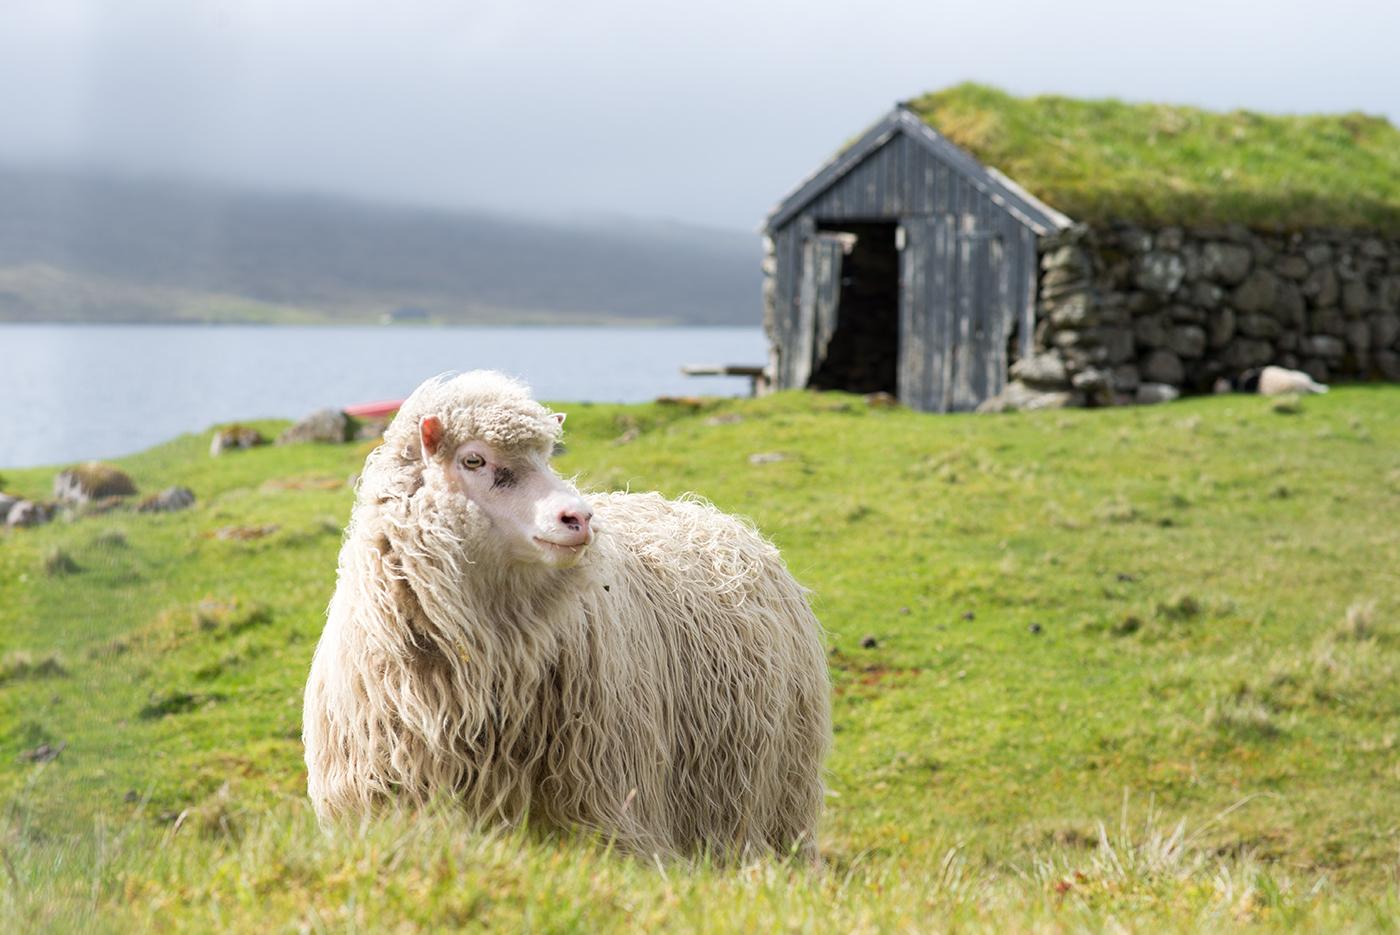 Sheep & Turf Shack